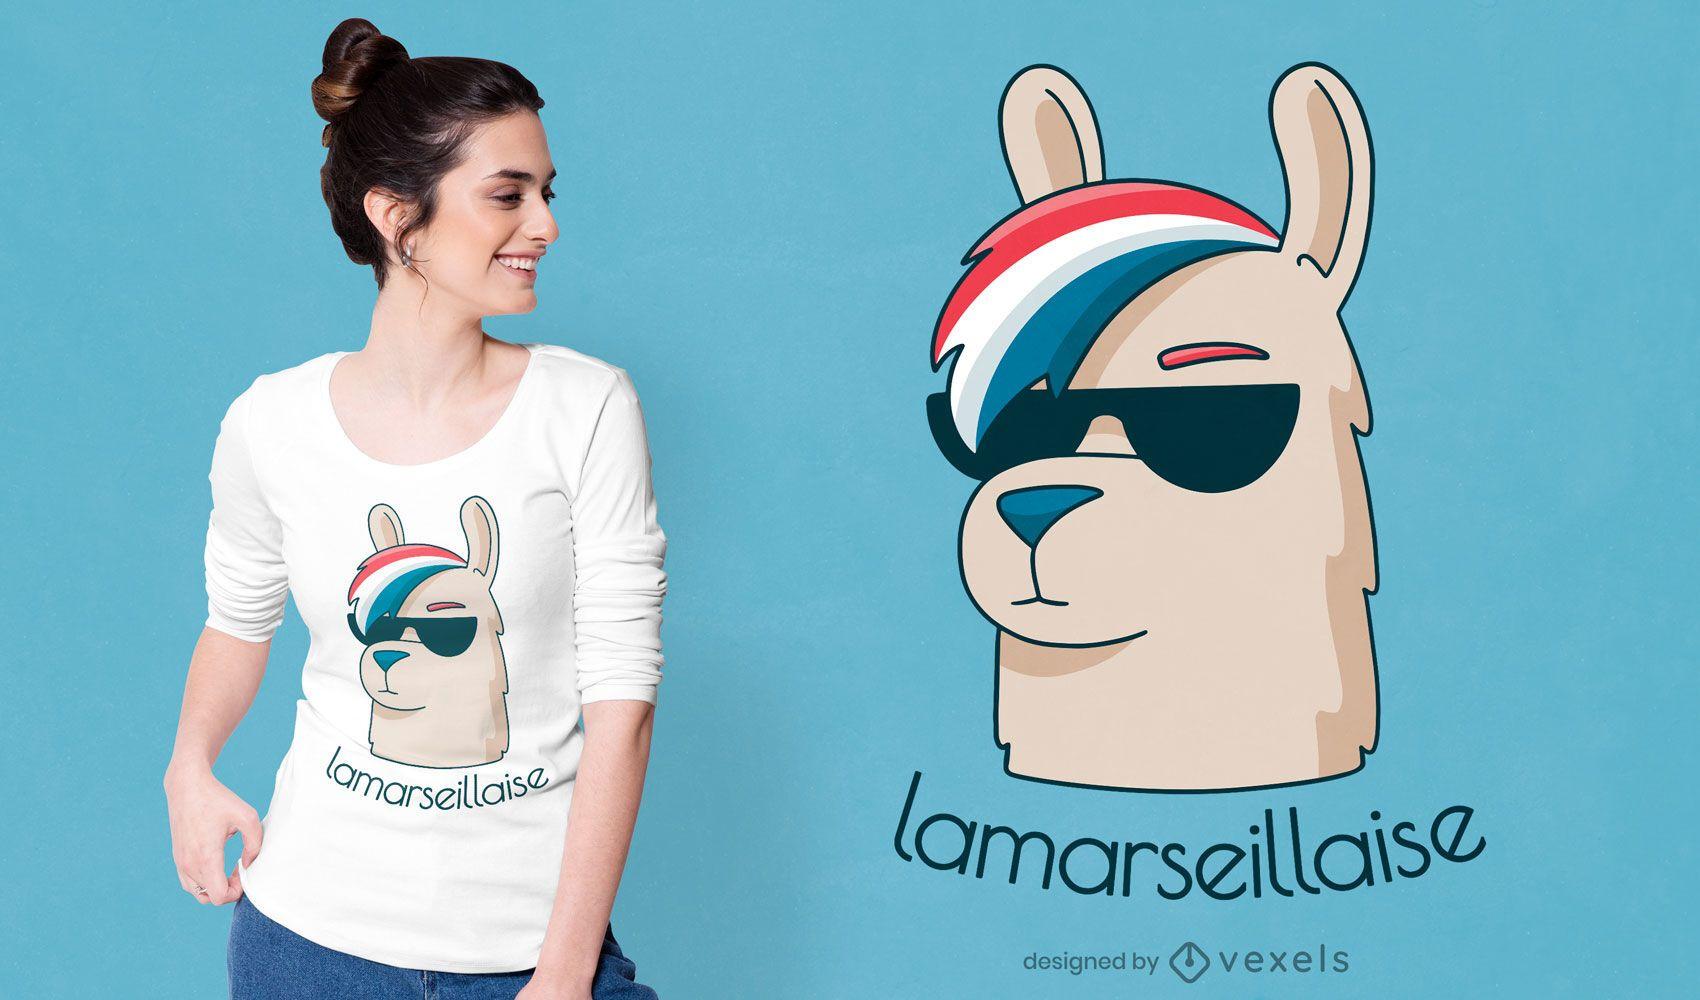 Funny la marseillaise t-shirt design